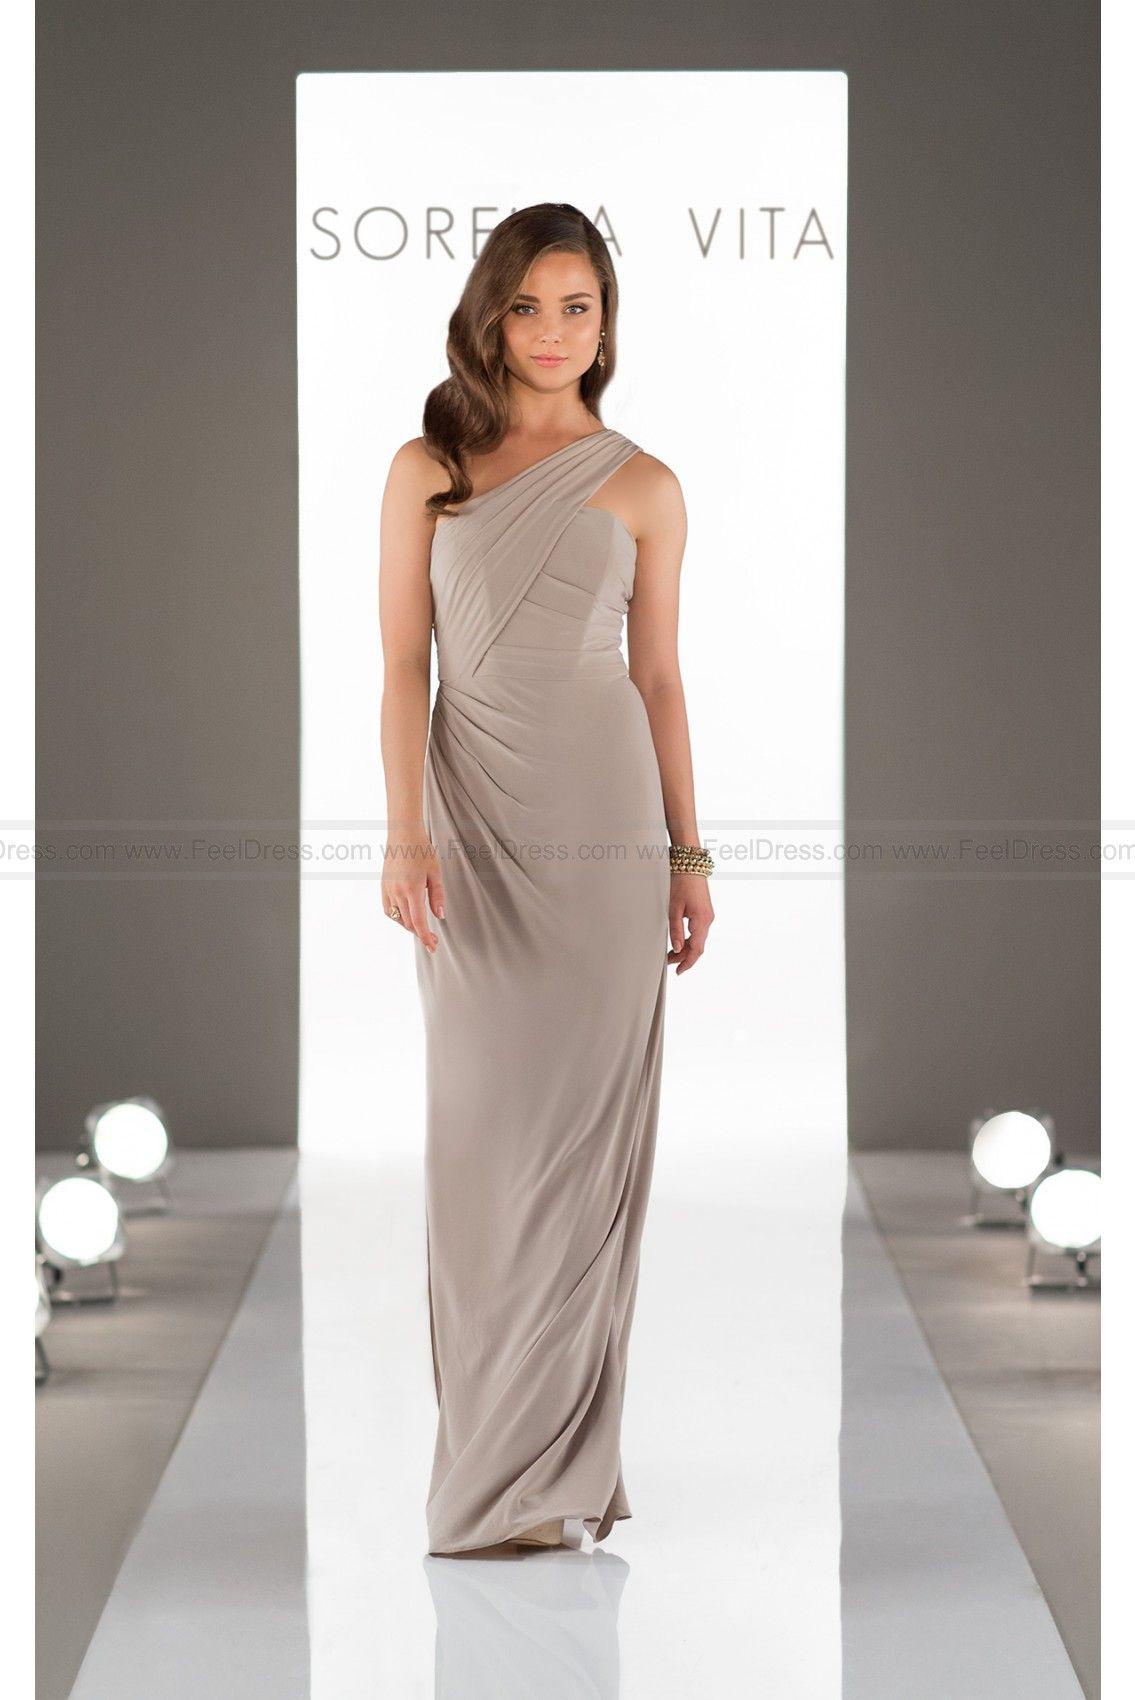 3c4f05404ea Sorella Vita One-Shoulder Sexy Bridesmaid Dress Style 8852